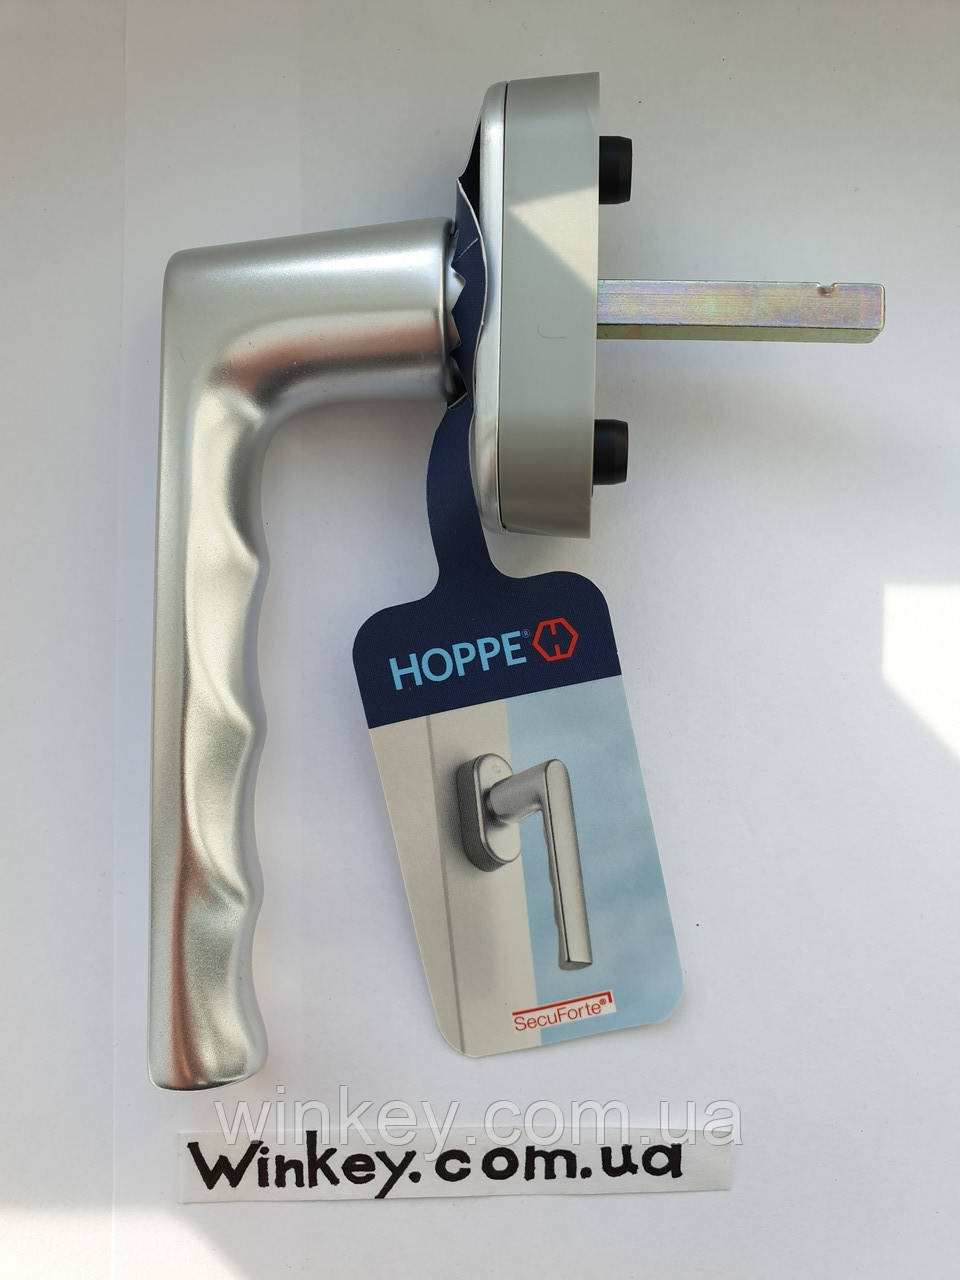 Ручка оконная Hoppe Нamburg SecuForte серебро оигинал Германия